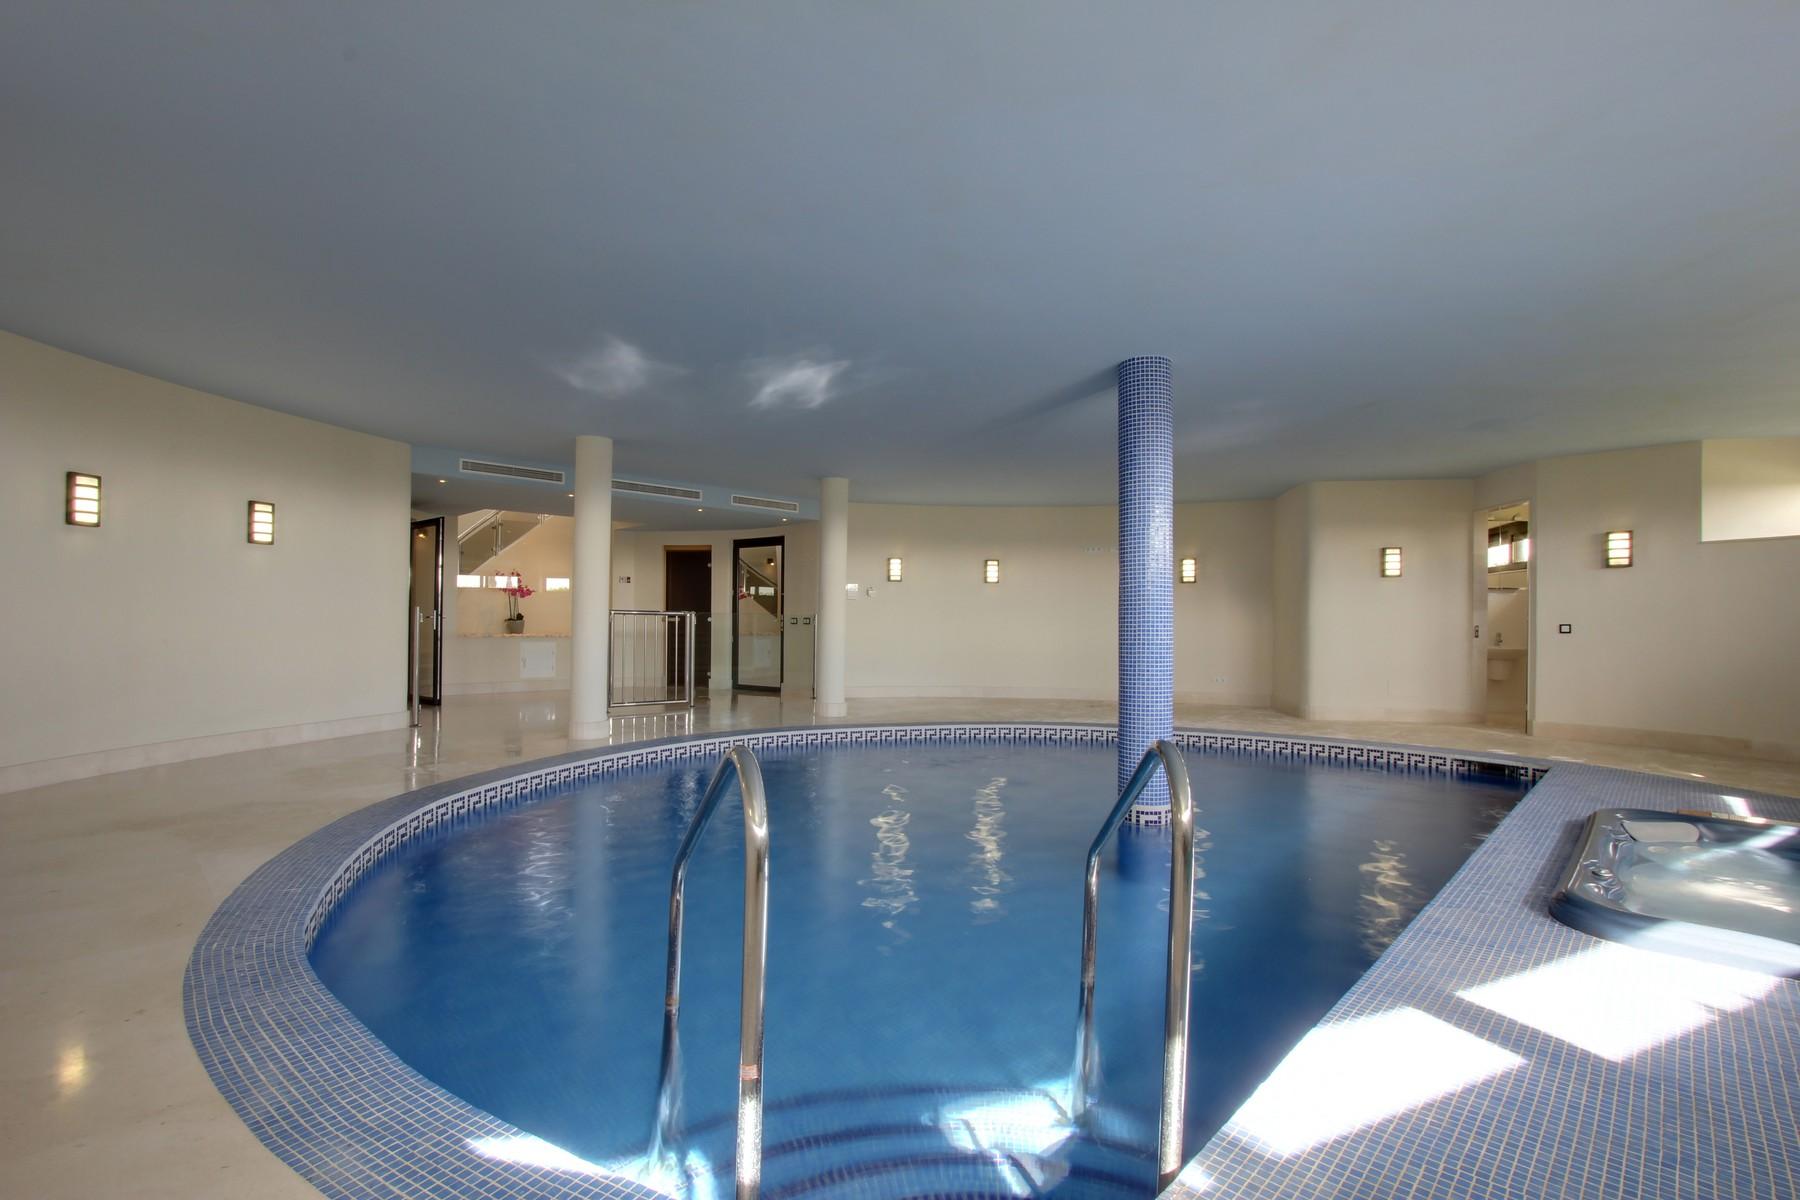 23-indoor-swimming-pool